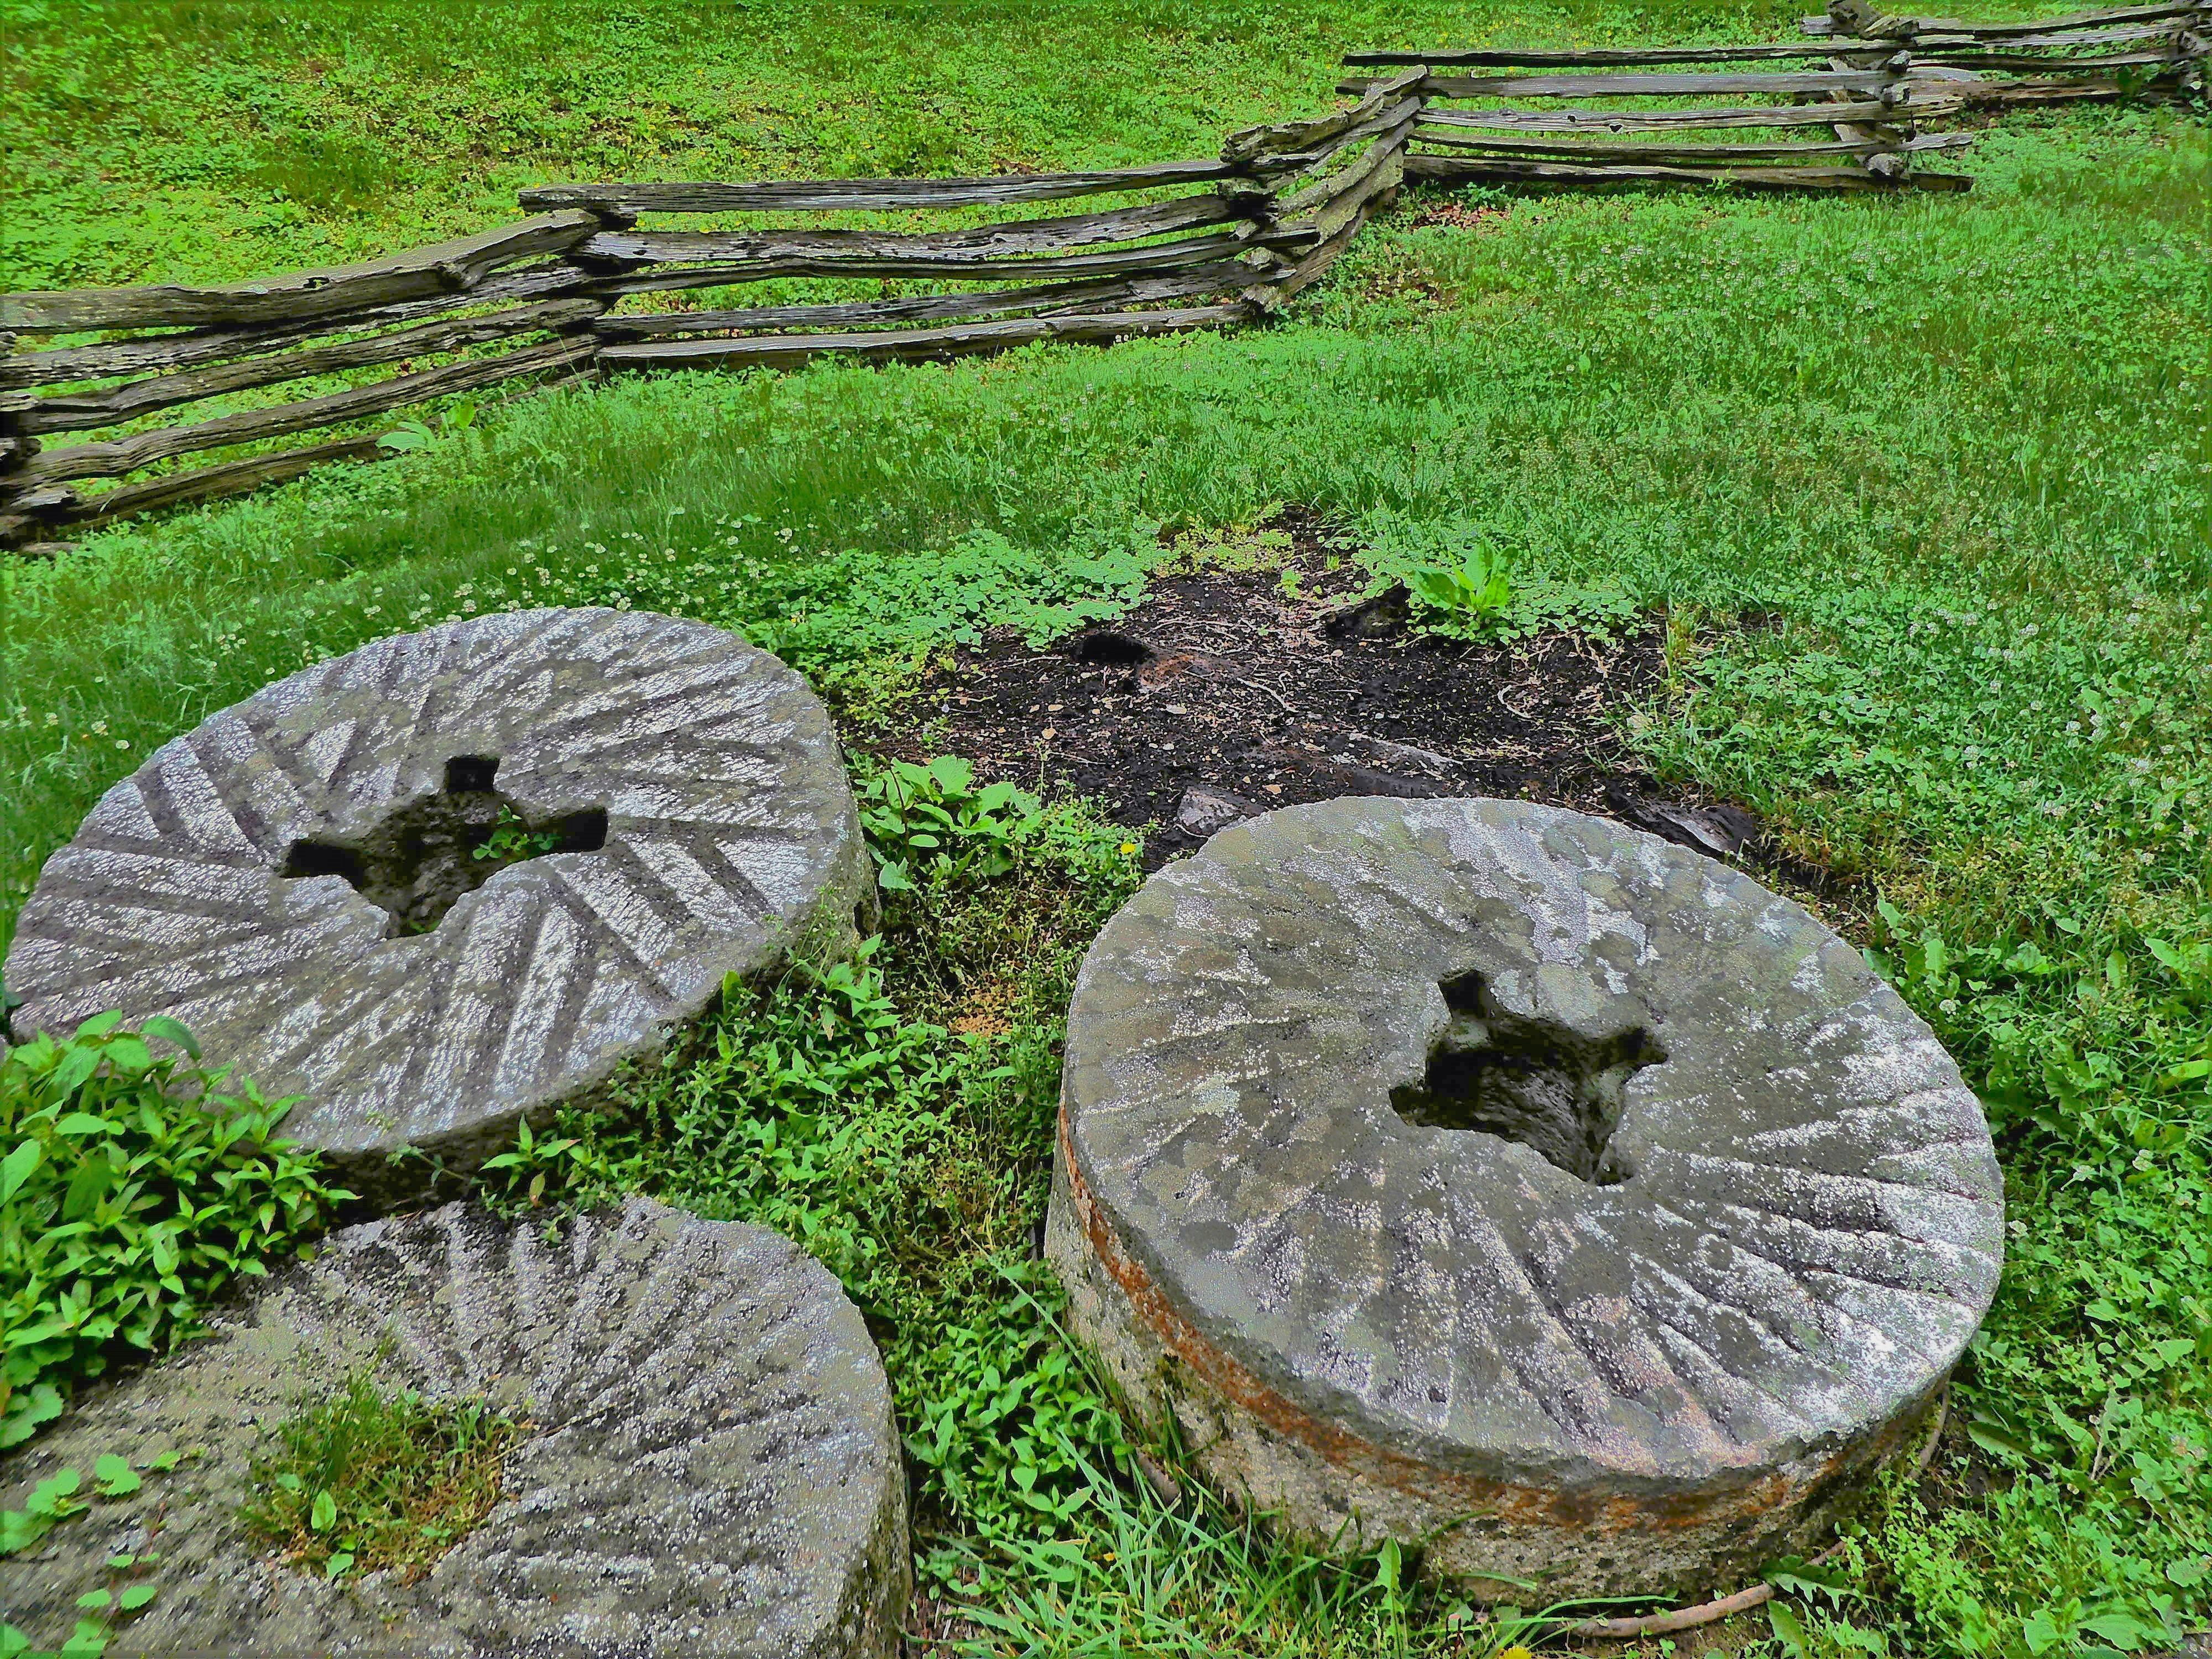 millstones and fences